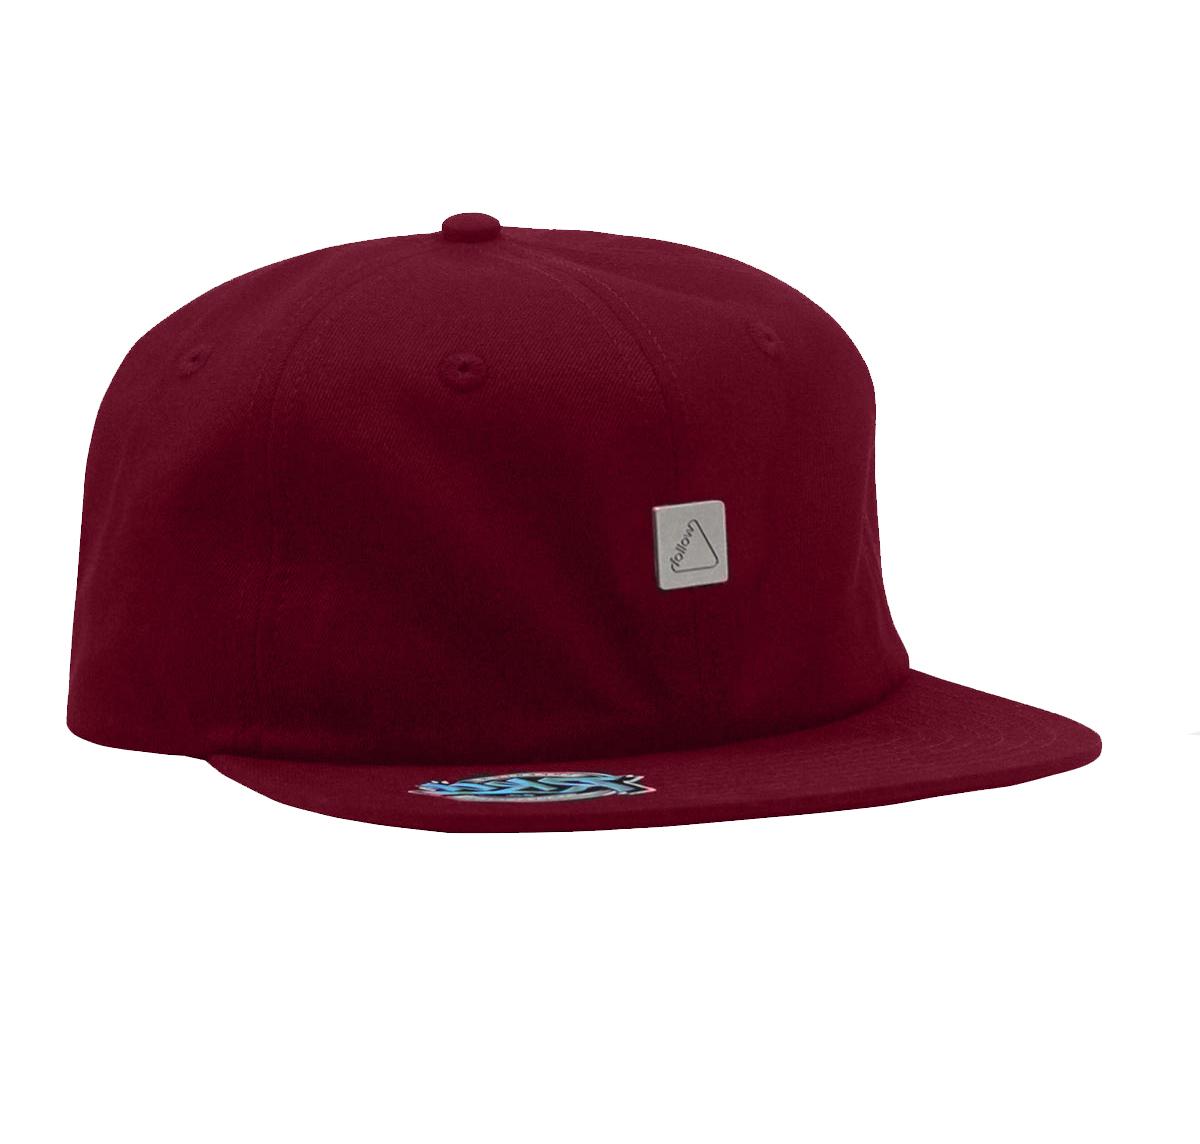 STAMPED FORMLESS HAT - HEMP FOLLOW 2019